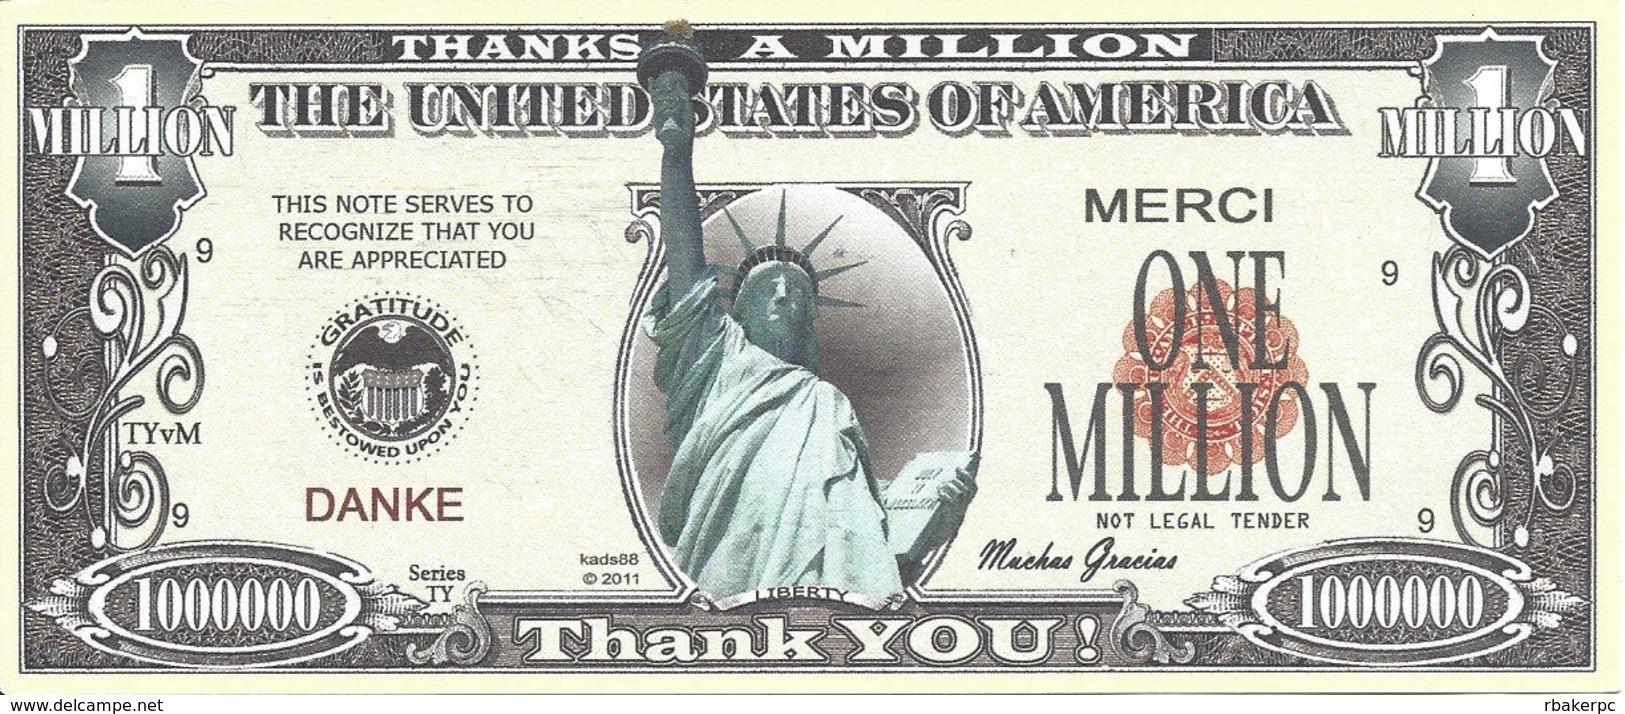 Fake Million Dollar Thank You Bill - United States Of America